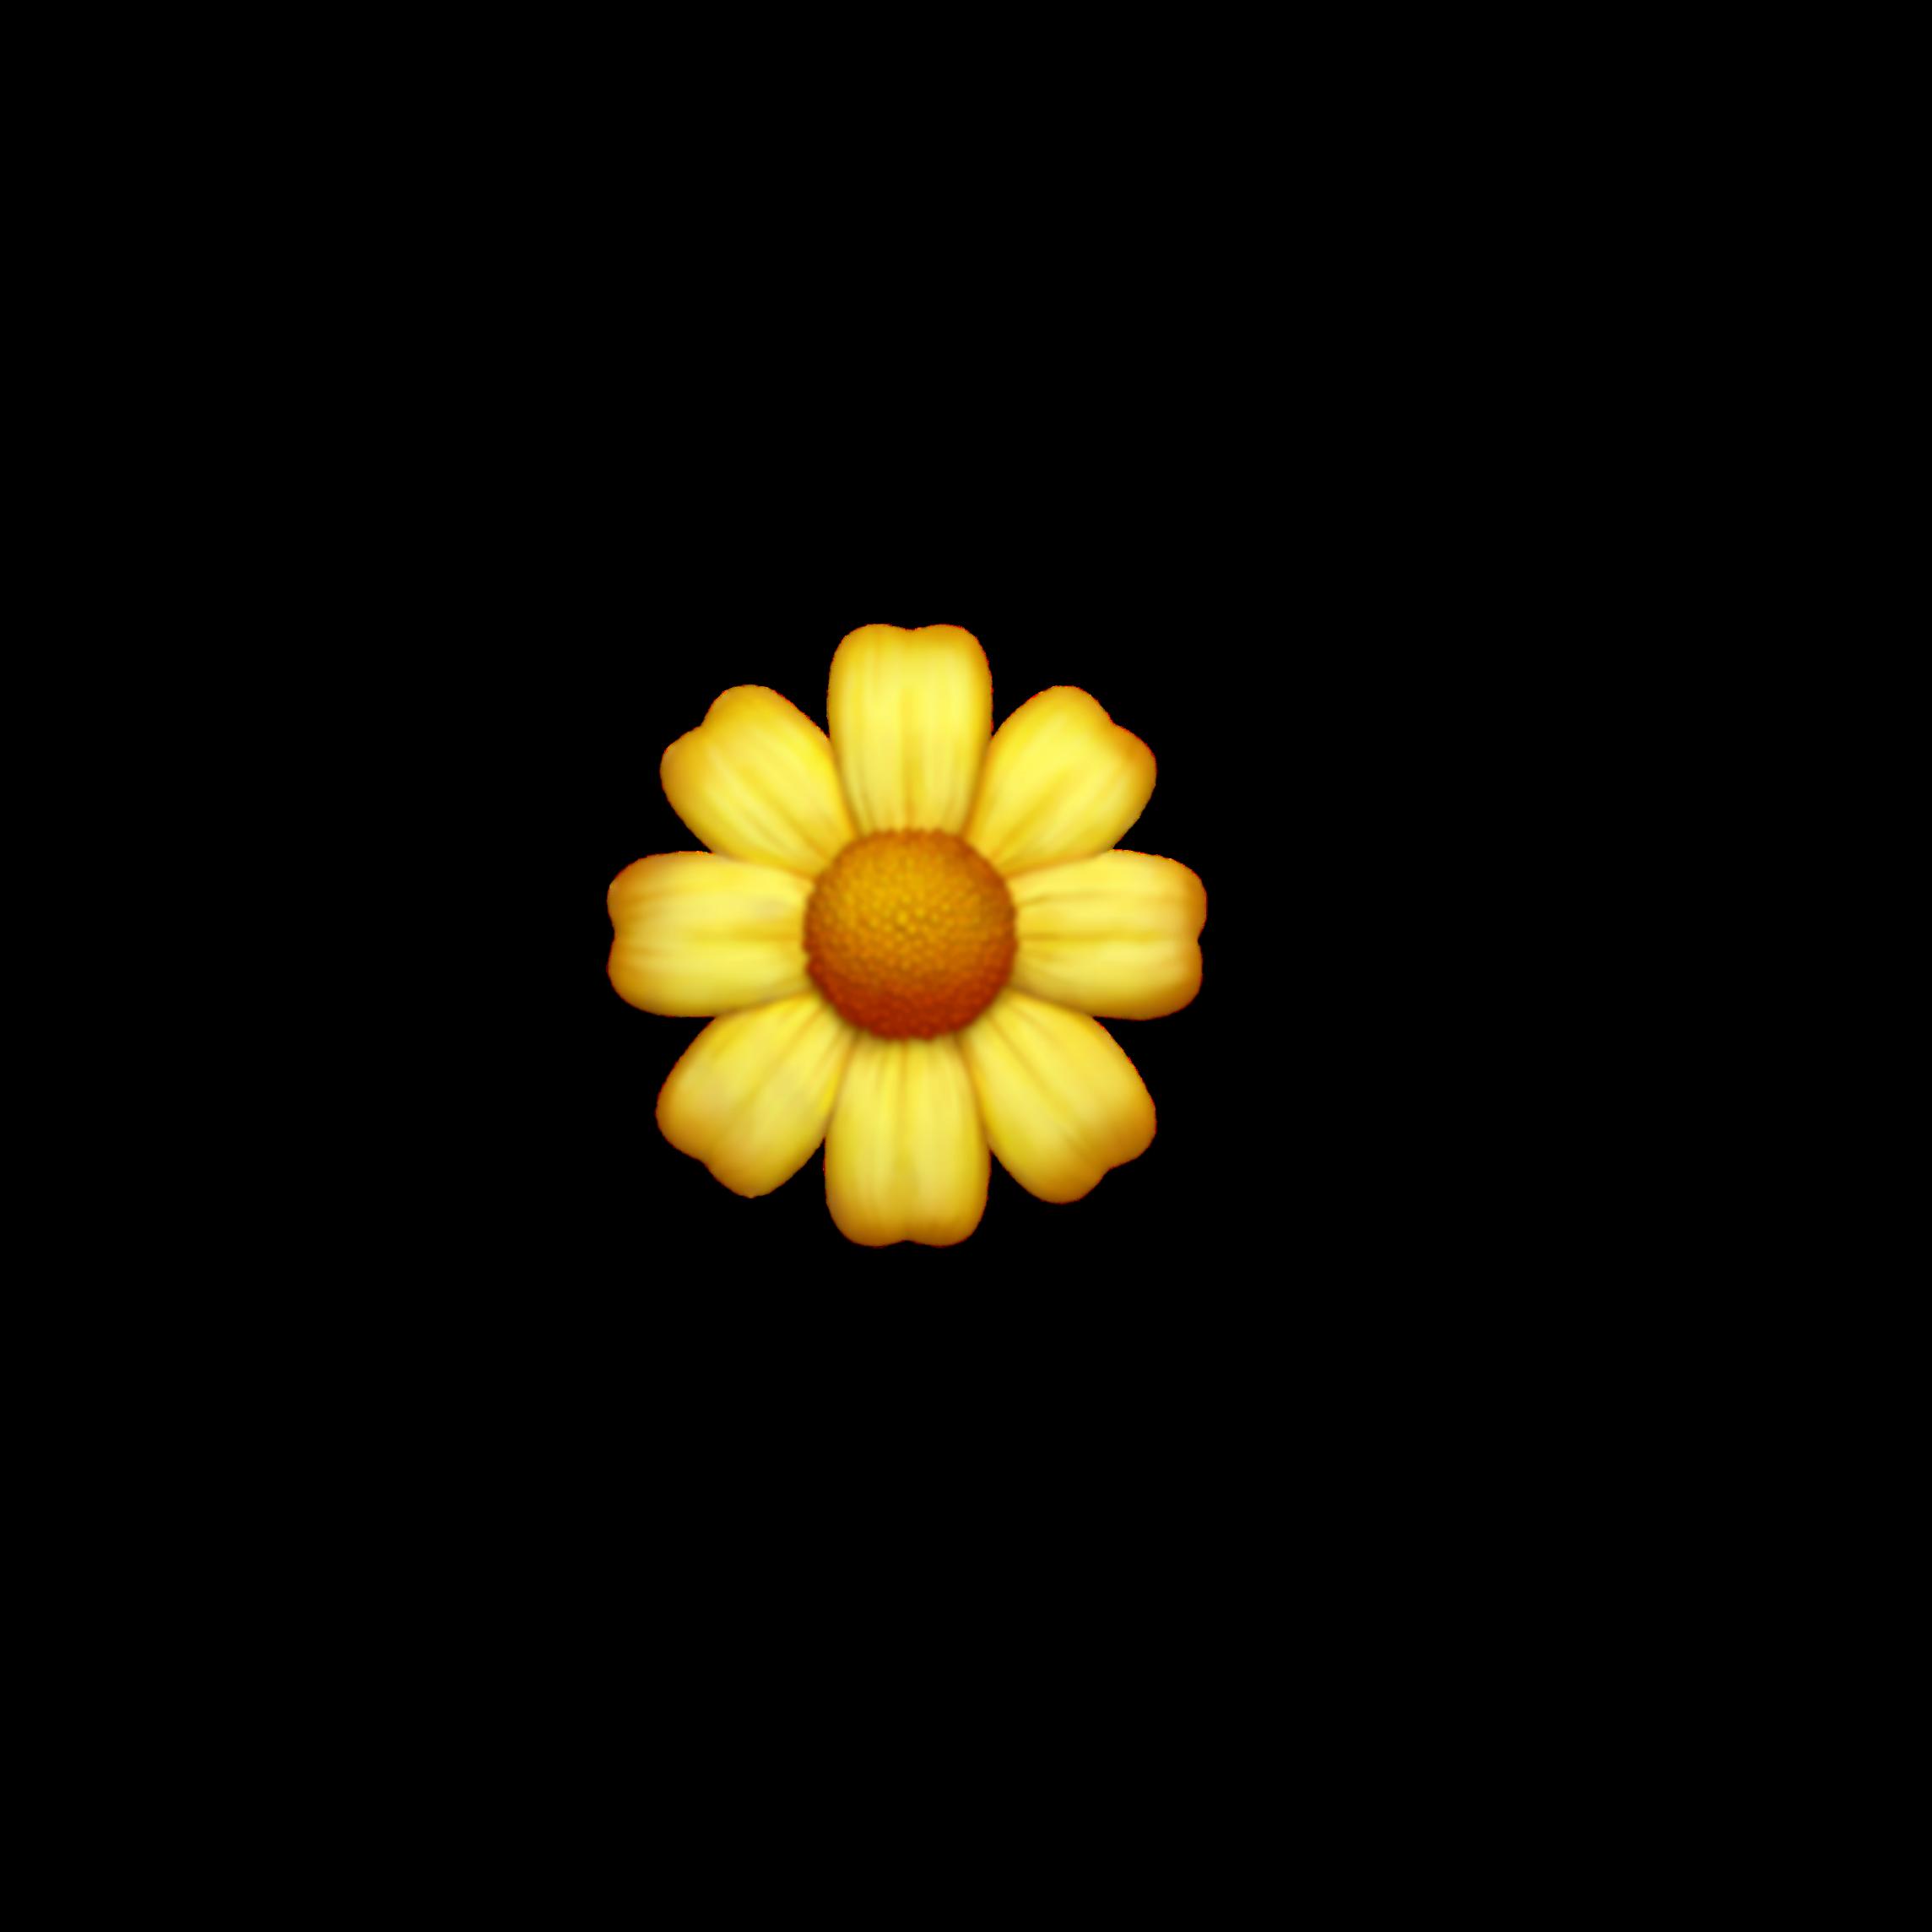 Clipart flower transparent emoji pictures picturesboss flower flowers emoji emojis tumblr sticker png 1024x1024 clipart flower transparent emoji pictures izmirmasajfo